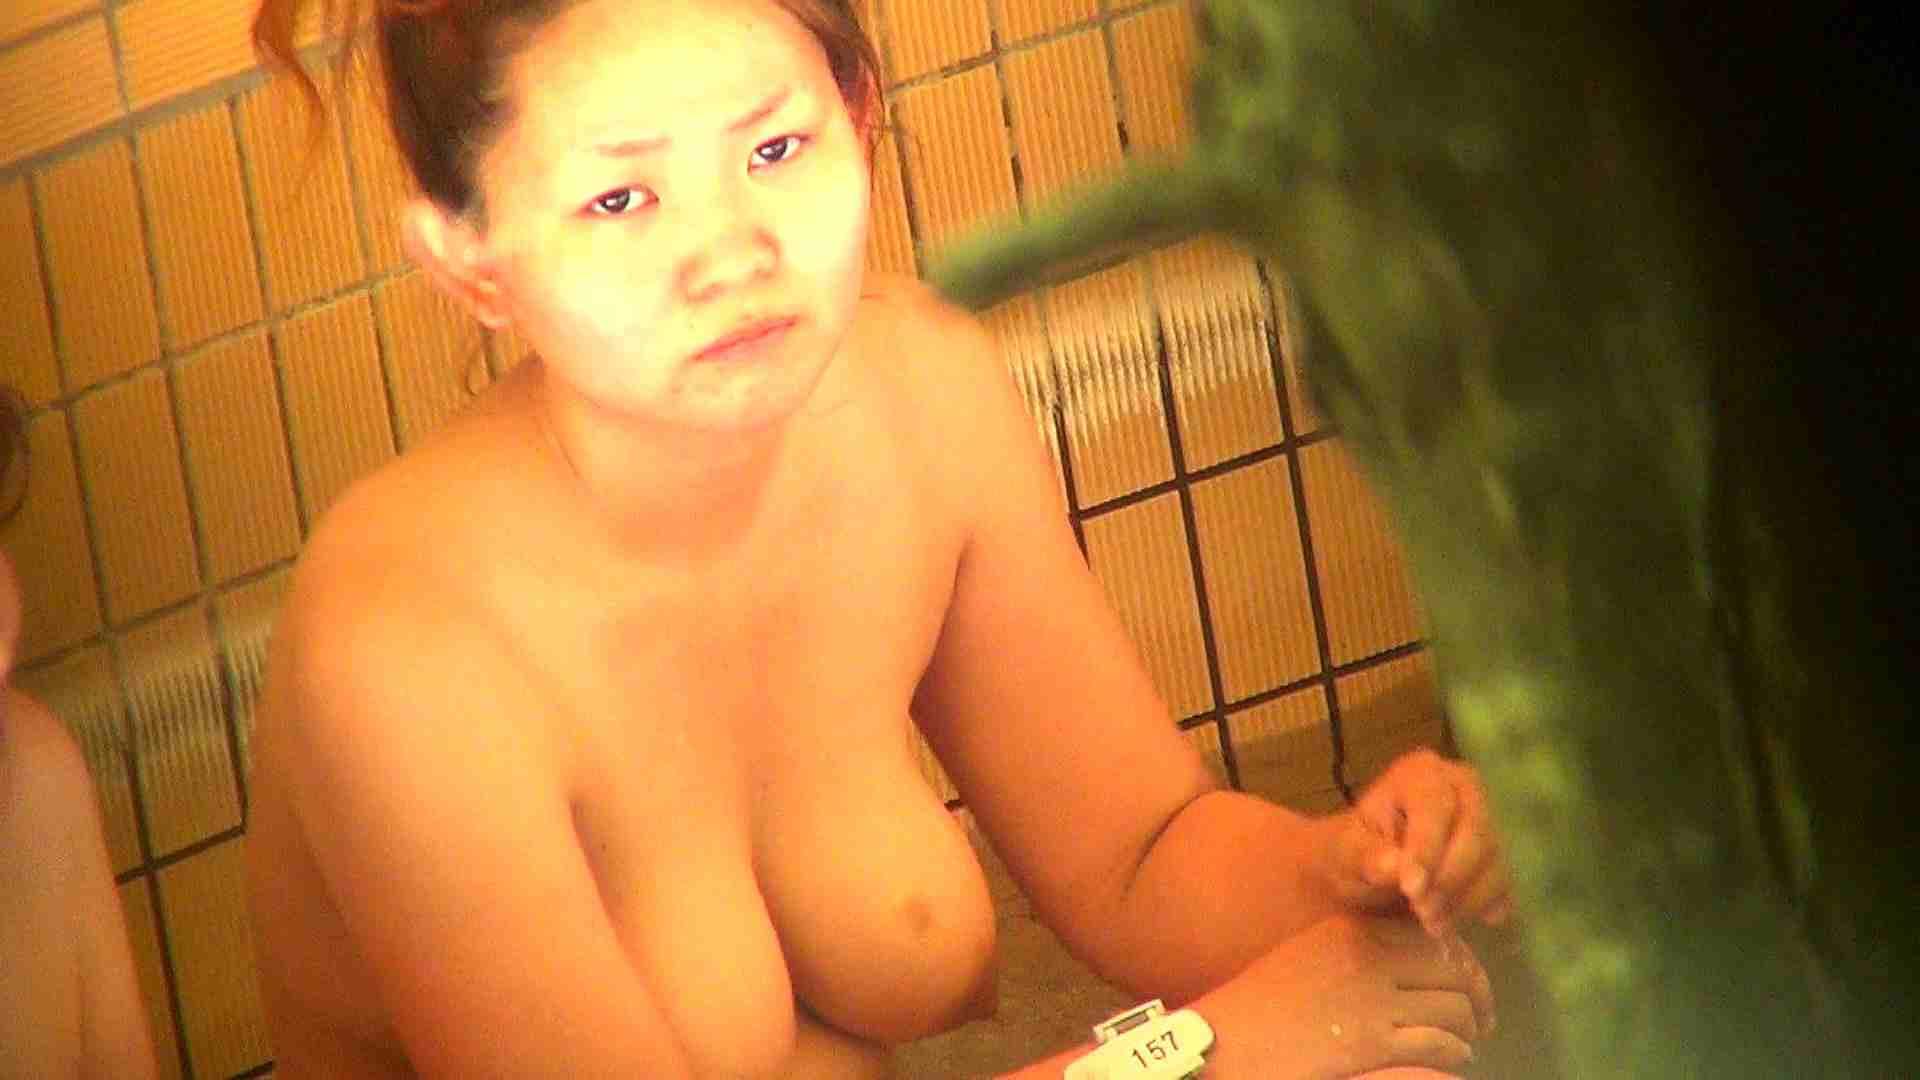 Vol.37 オデブと妊婦とokaasann 妊婦萌え スケベ動画紹介 94枚 69